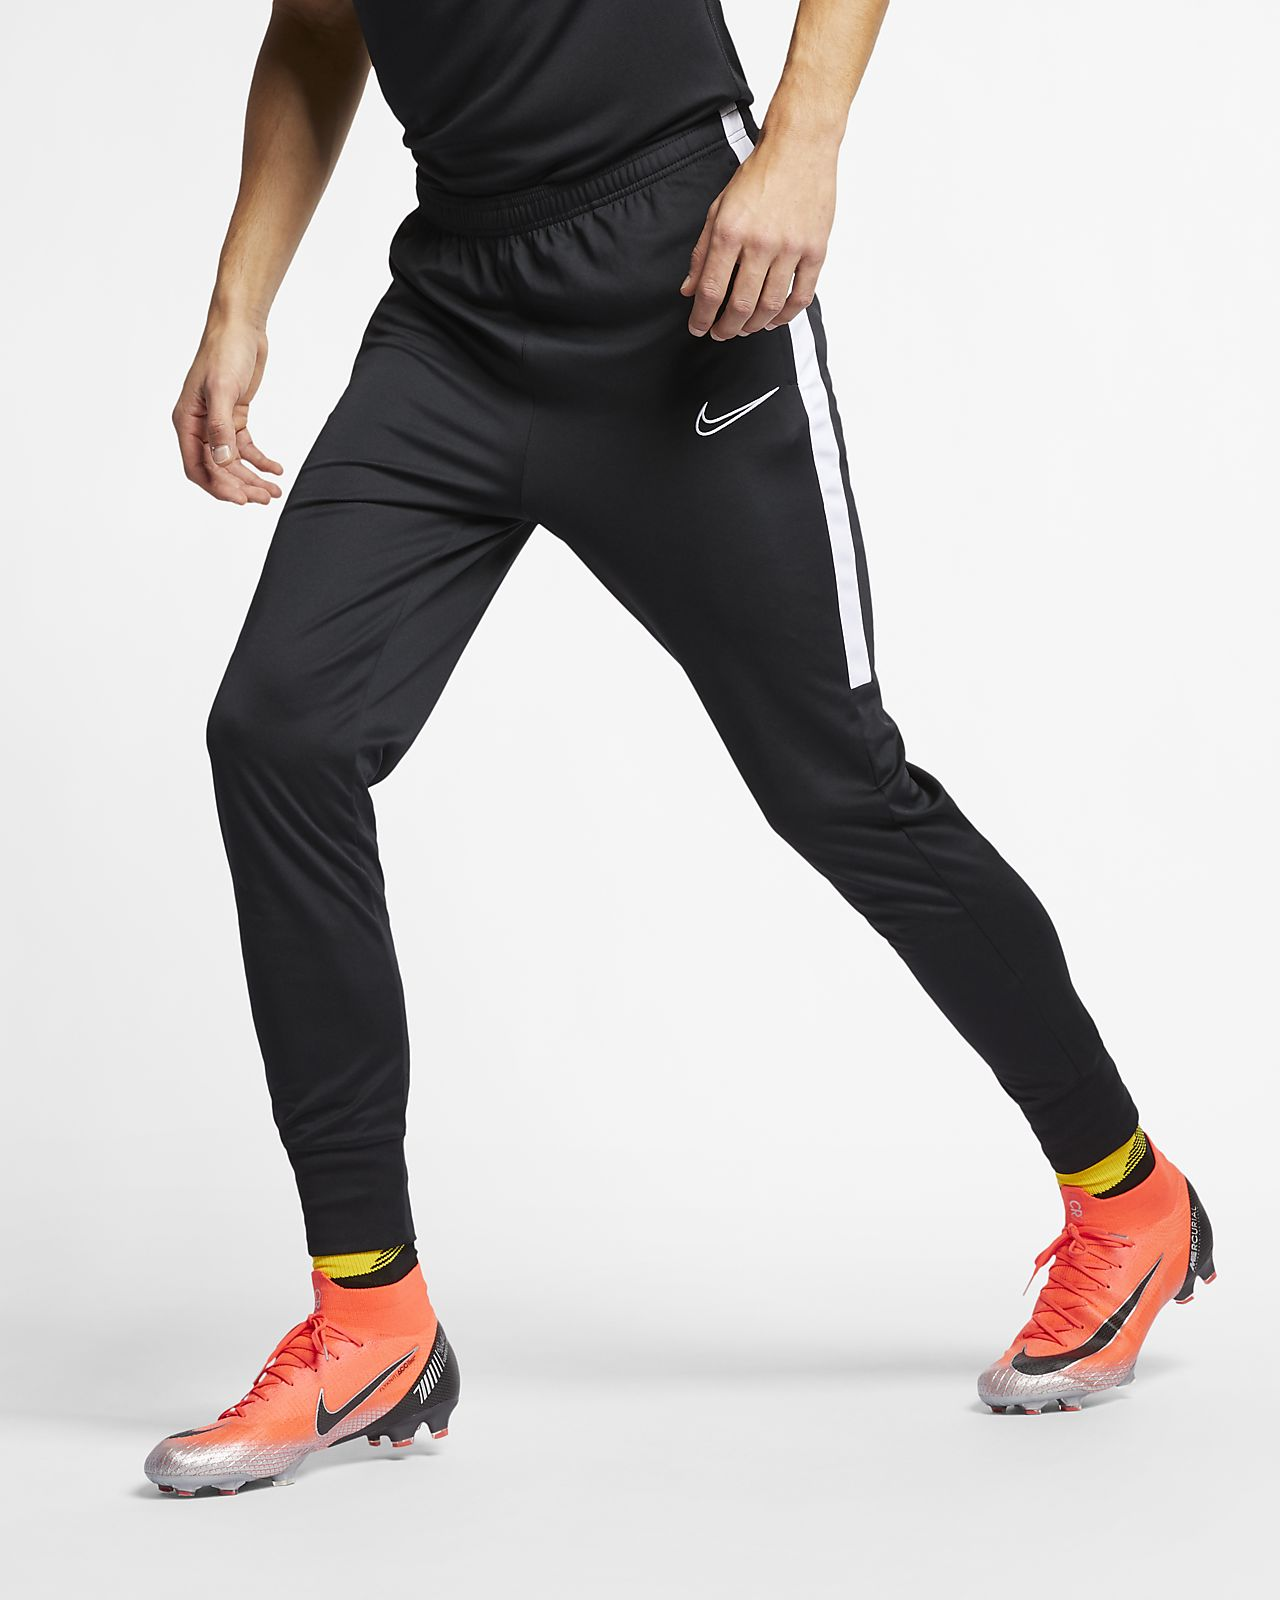 73854b63df883 Nike Dri-FIT Academy Men's Football Pants. Nike.com GB